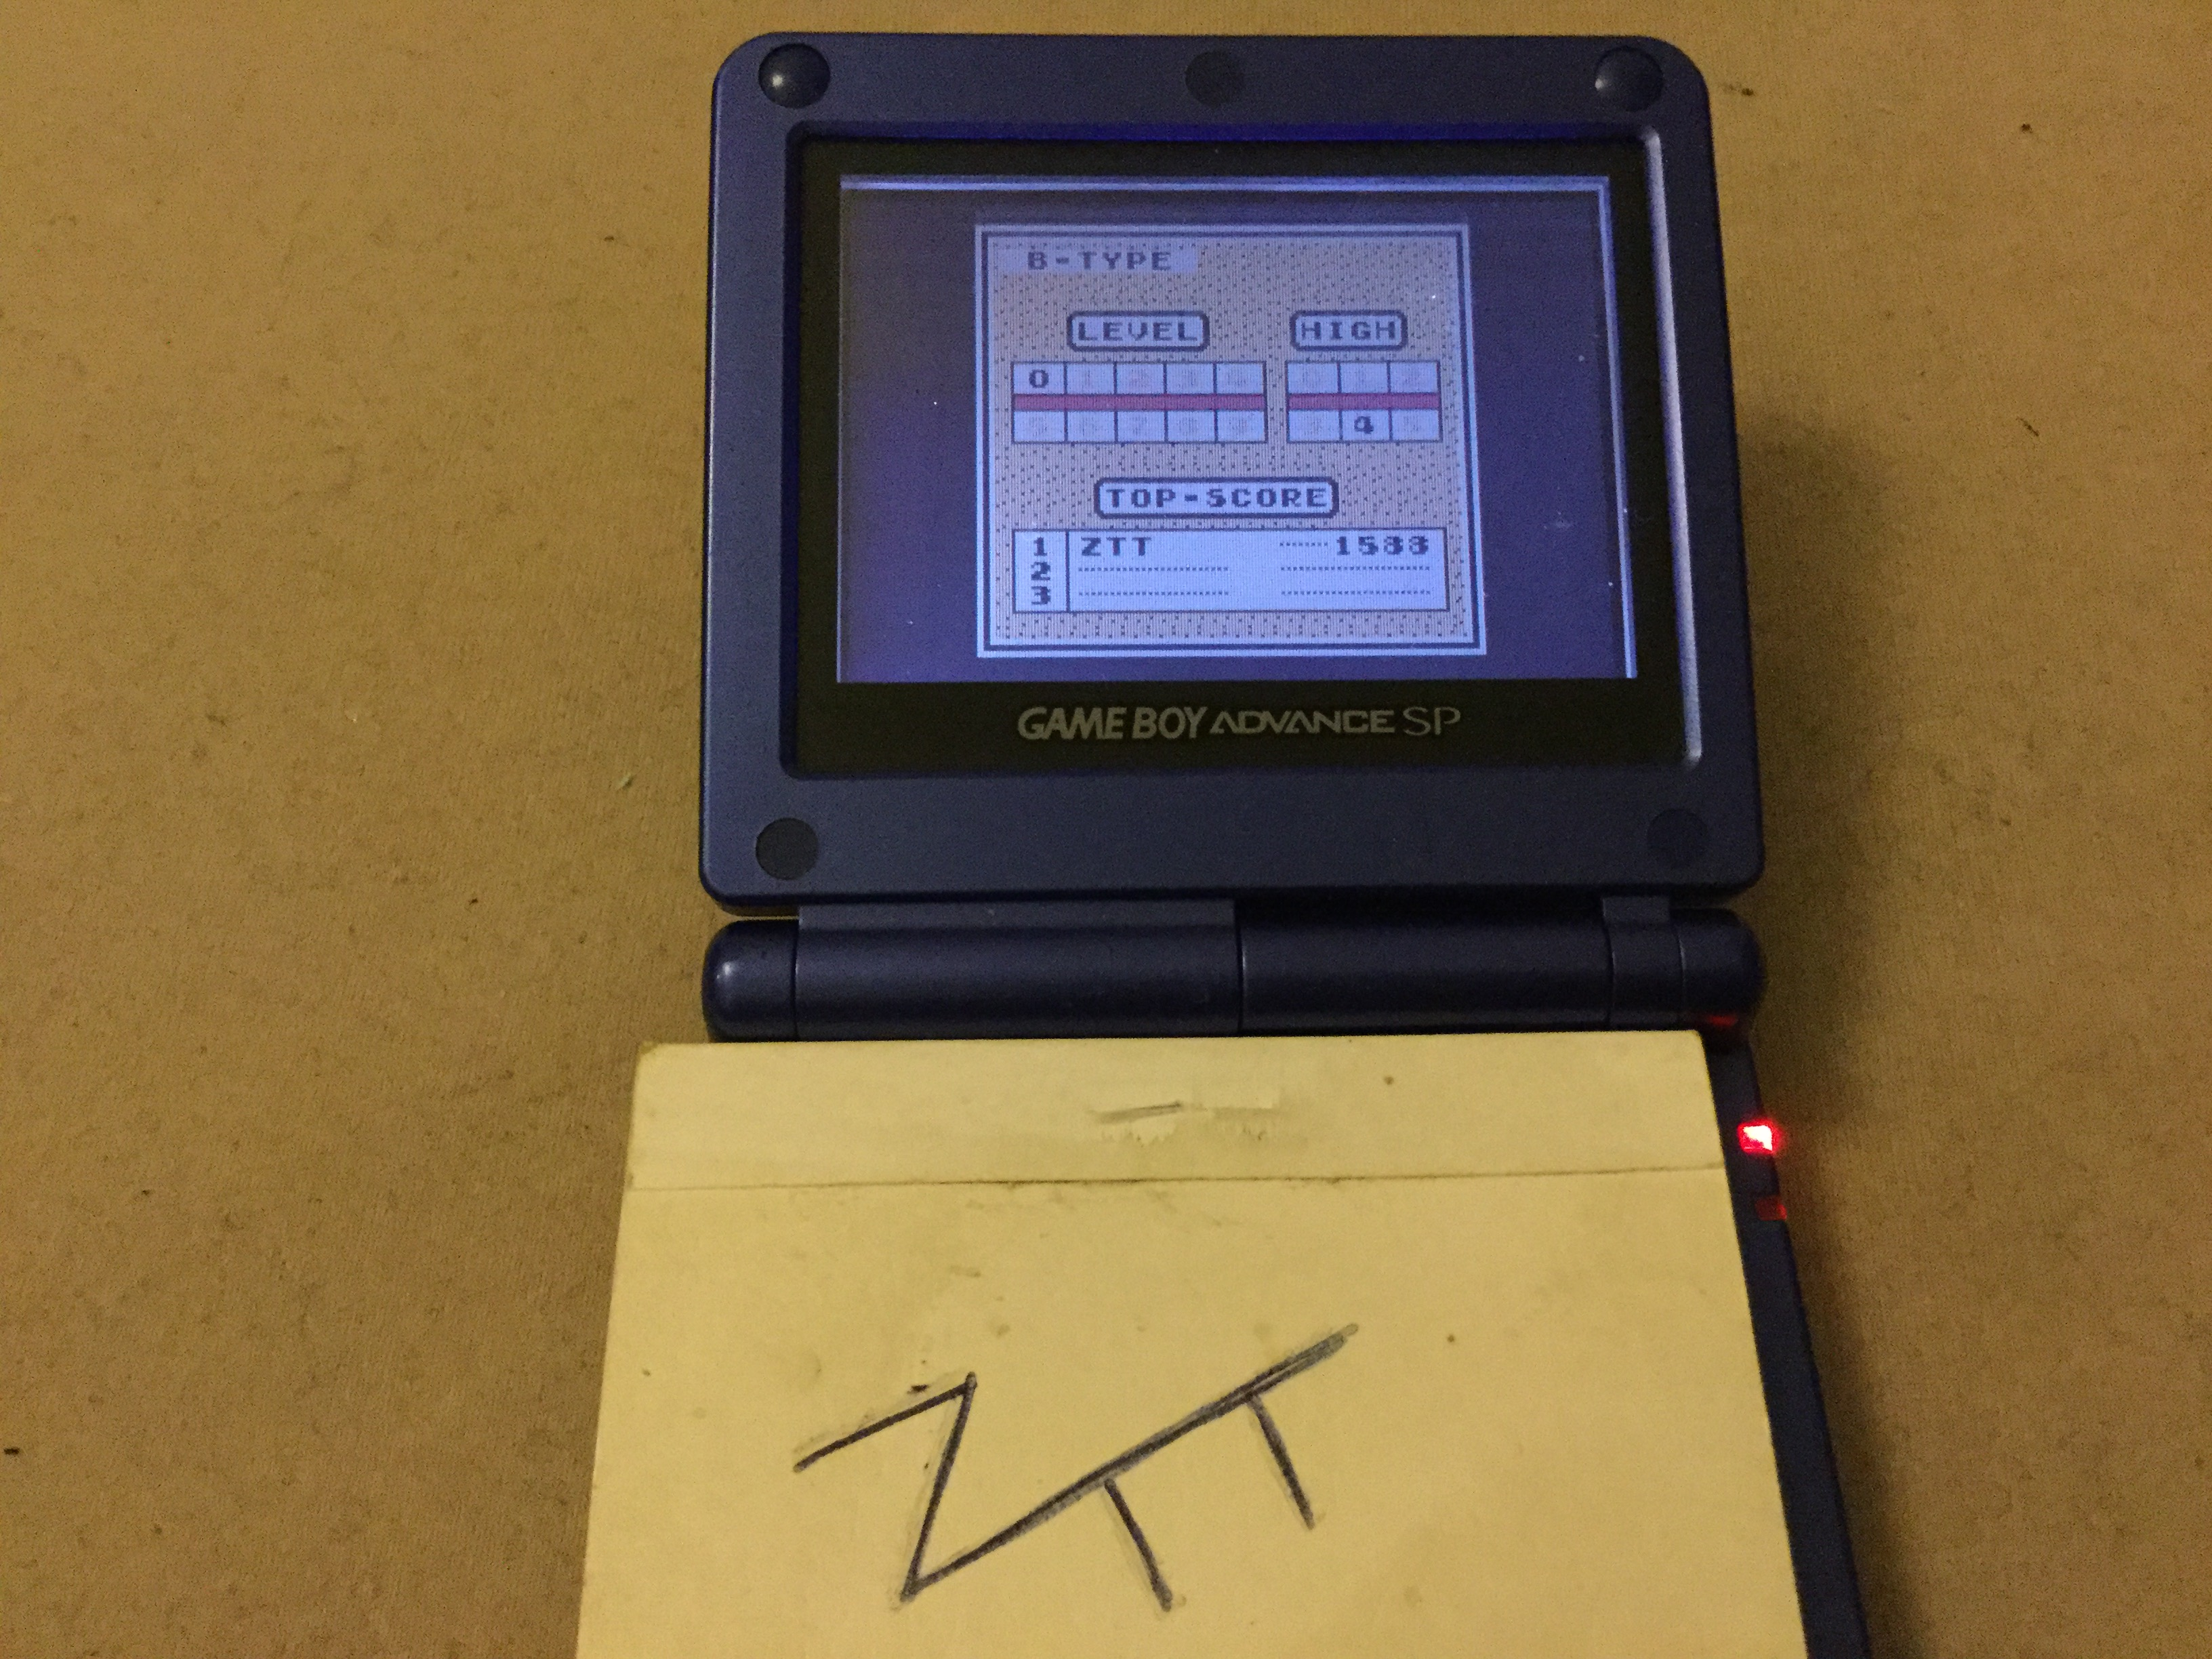 Frankie: Tetris: Type B [Level 0 / High 4] (Game Boy) 1,588 points on 2019-11-13 12:14:43